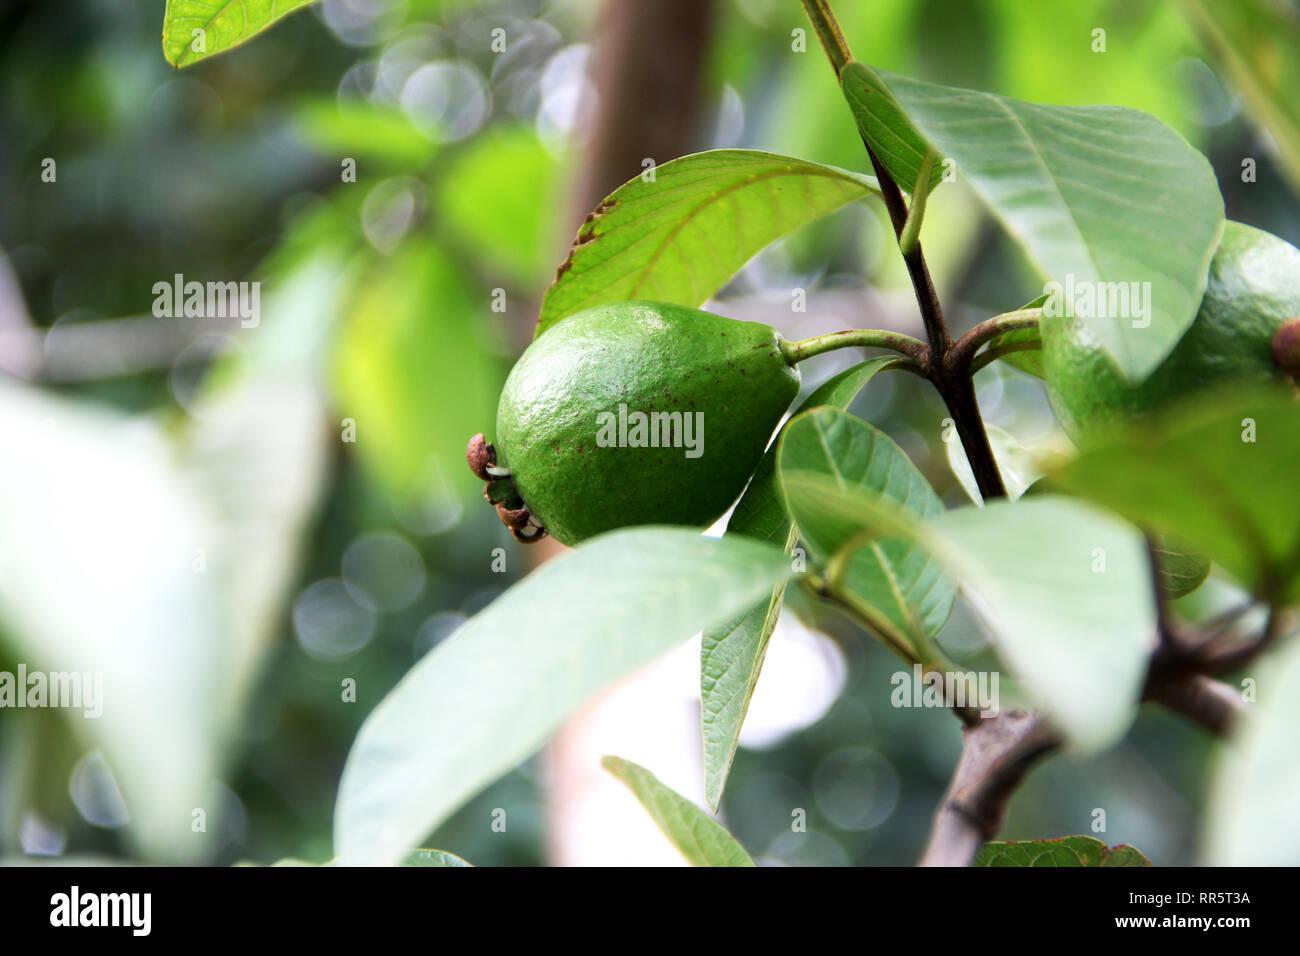 Guava Tree Stock Photos & Guava Tree Stock Images - Alamy